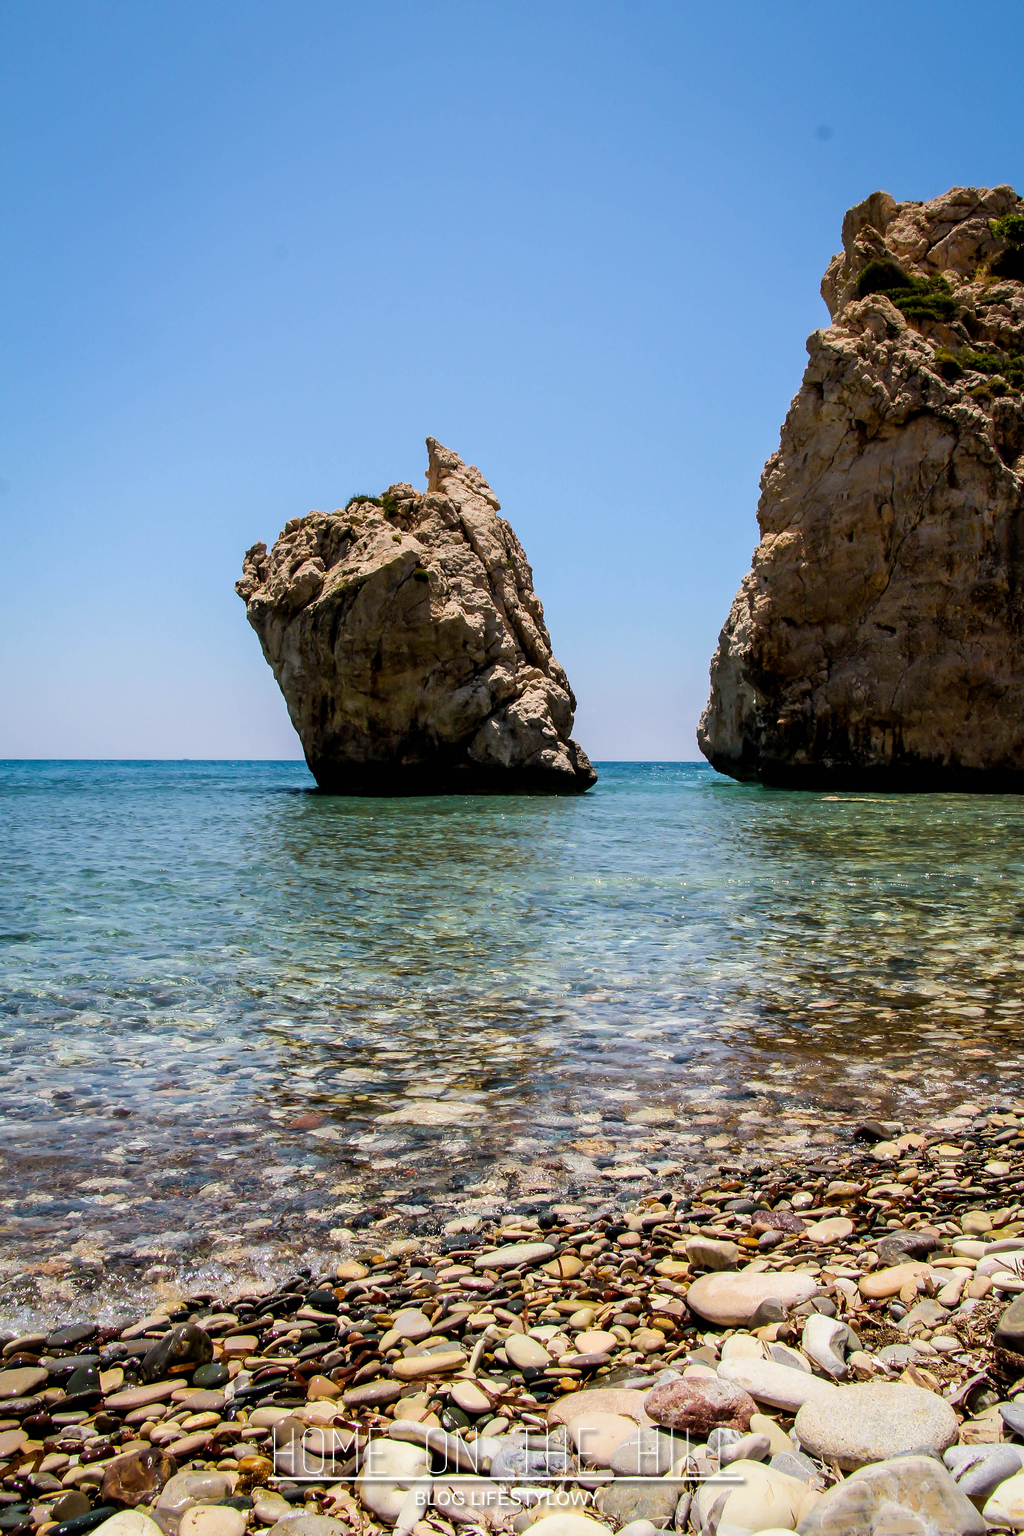 plaża afrodyty cypr